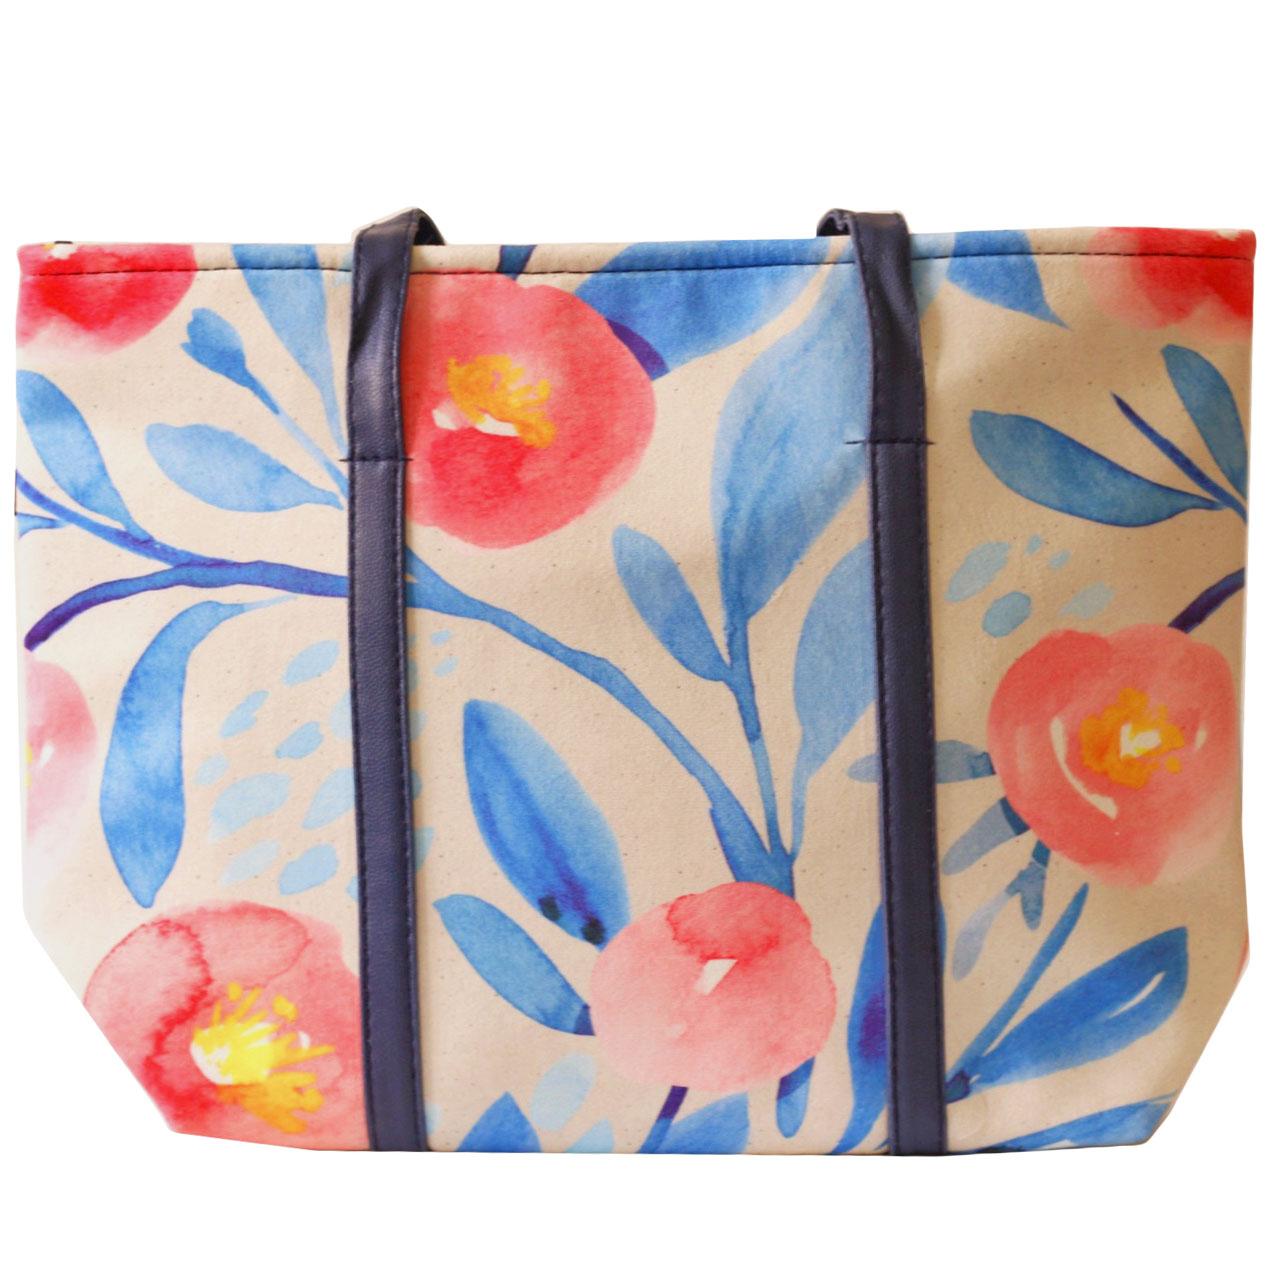 کیف دوشی زنانه طرح Floral کد MB06